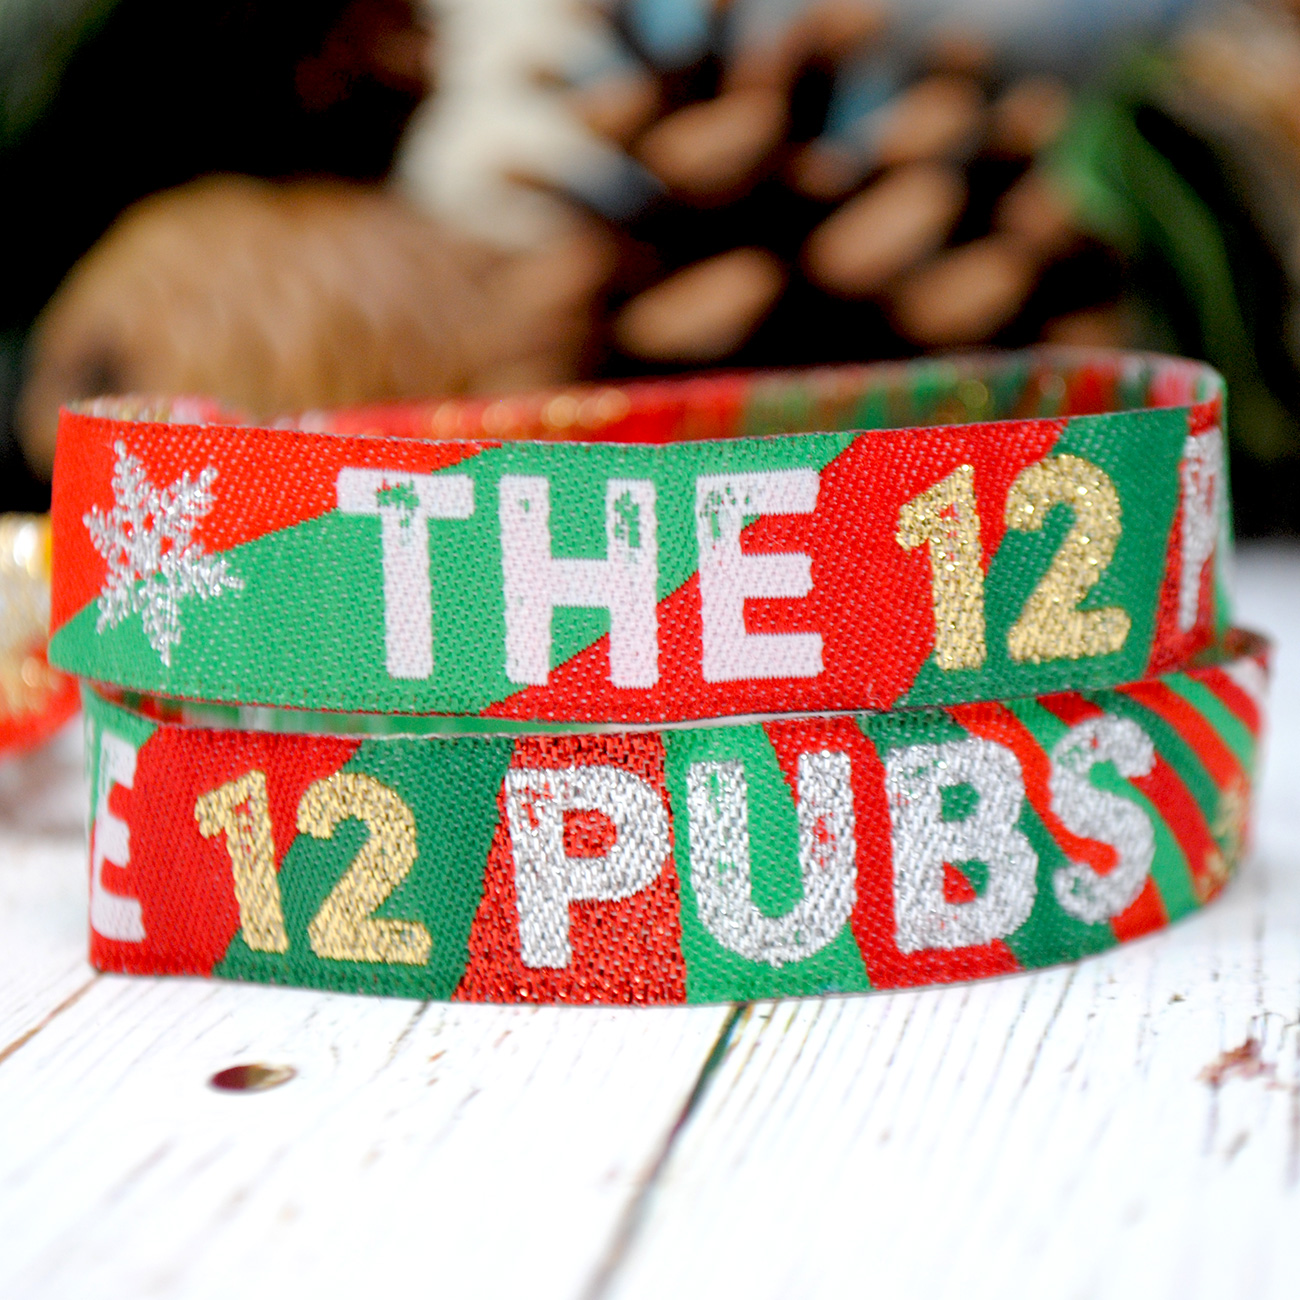 the 12 pubs christmas pub crawl wristbands